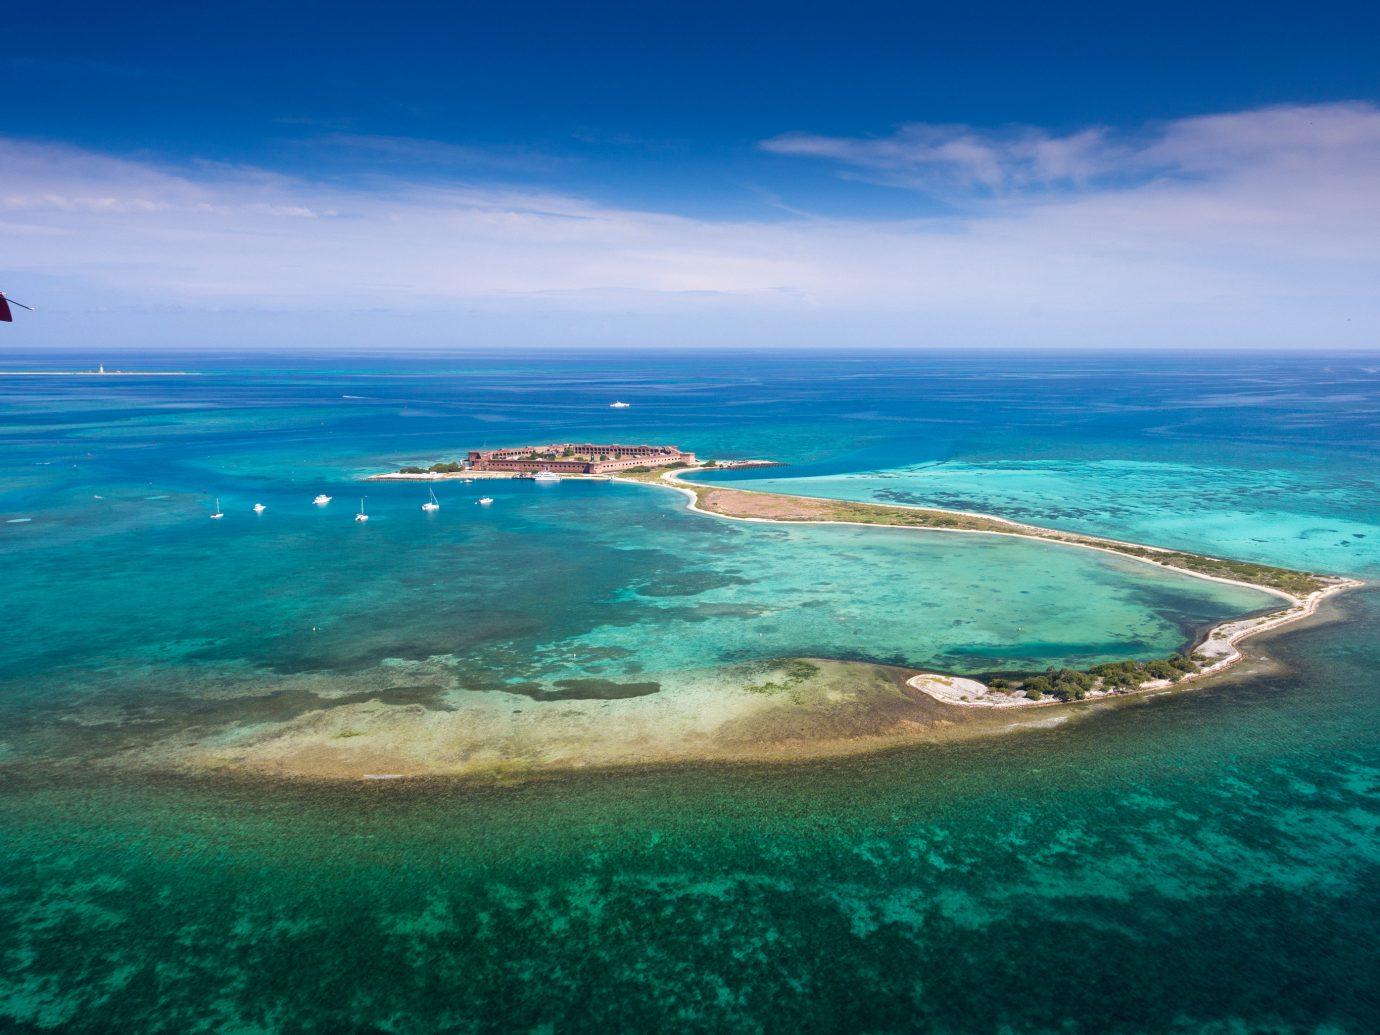 water sky Ocean outdoor Sea Nature geographical feature landform blue horizon Coast reef archipelago caribbean islet wind wave shore Island cape wave Beach atoll bay Lagoon swimming